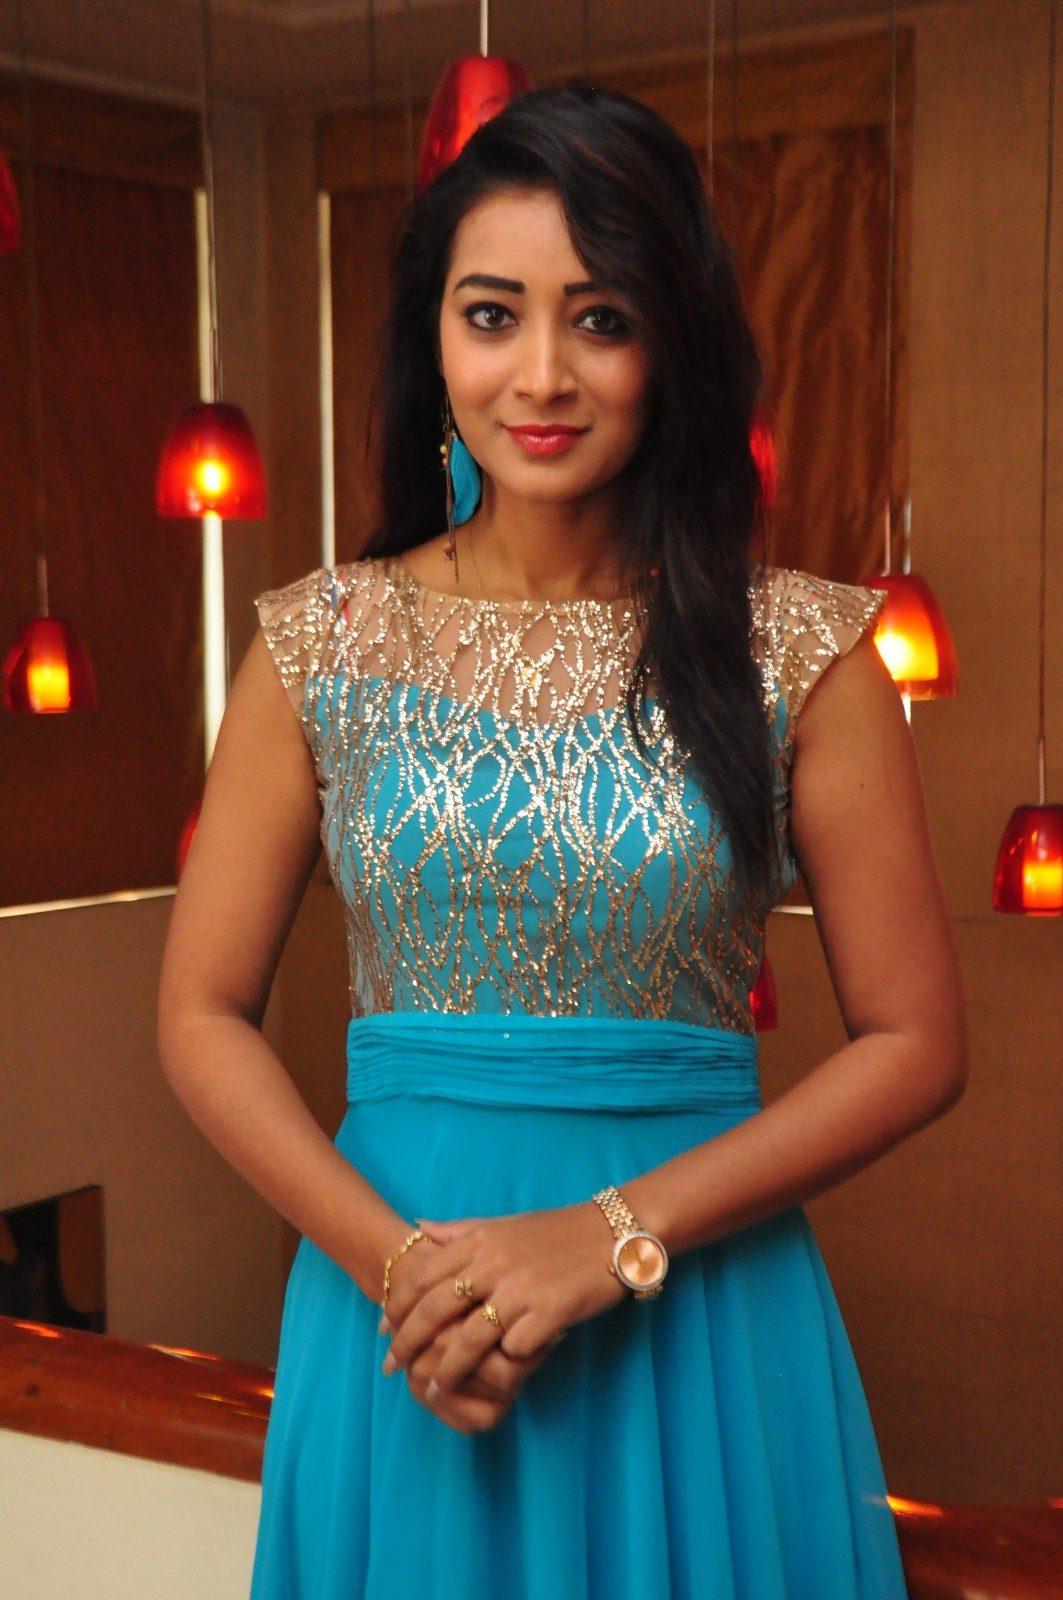 Bhanu tripathi blue dress unseen wallpaper